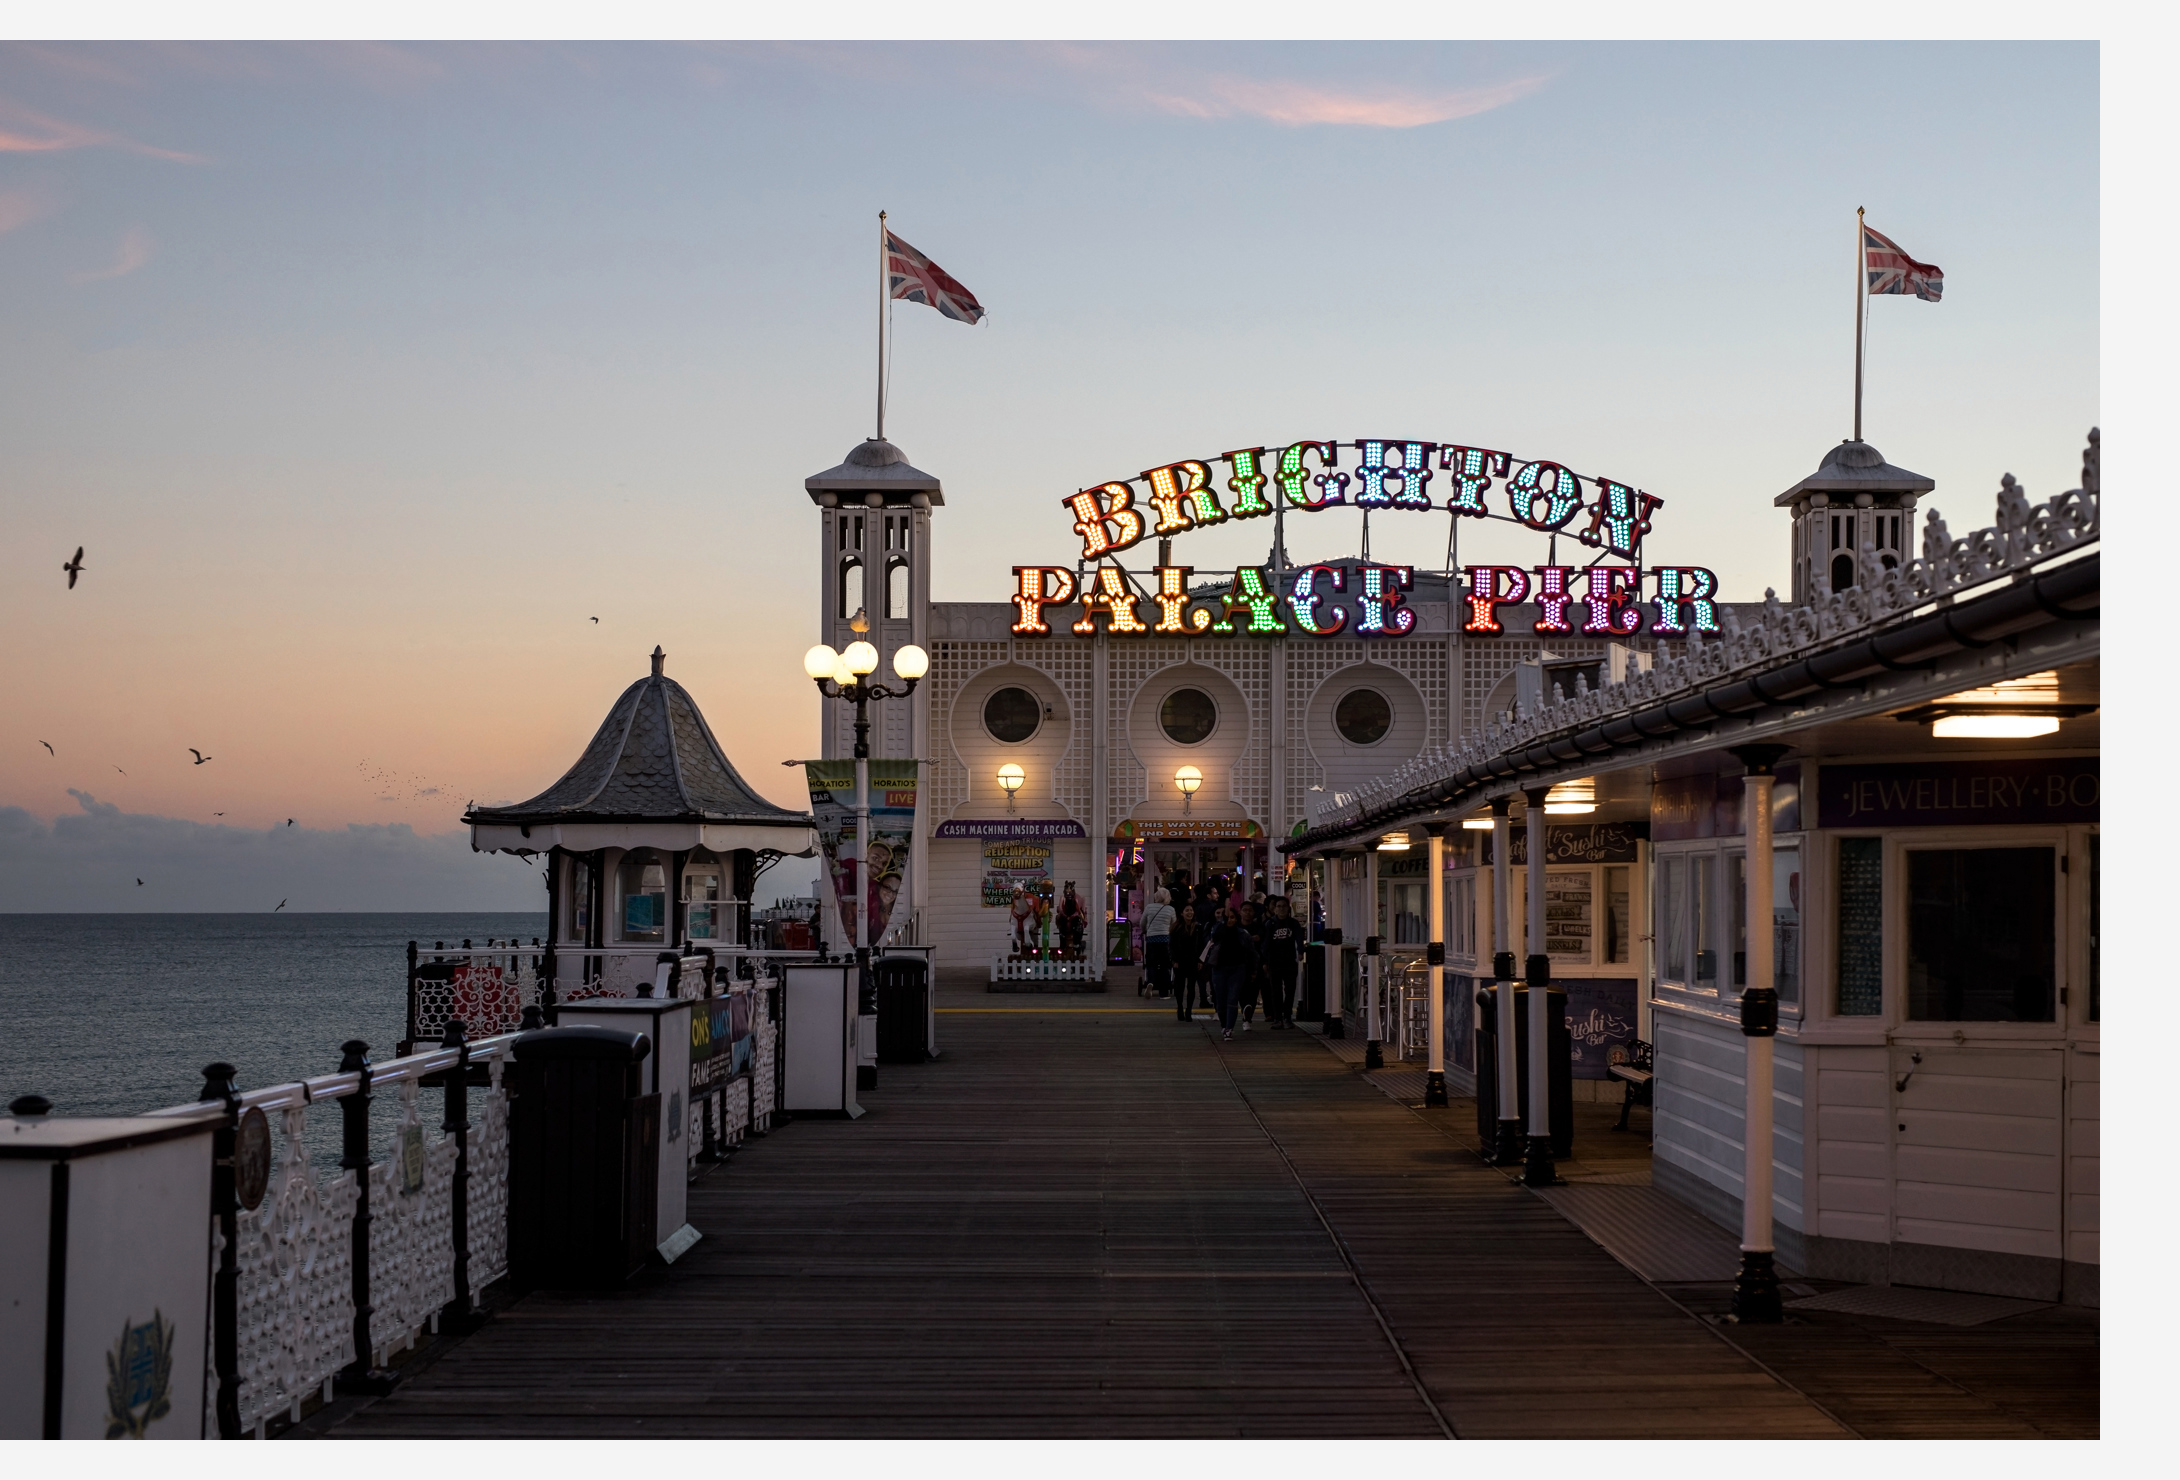 onthenorway brighton pier england